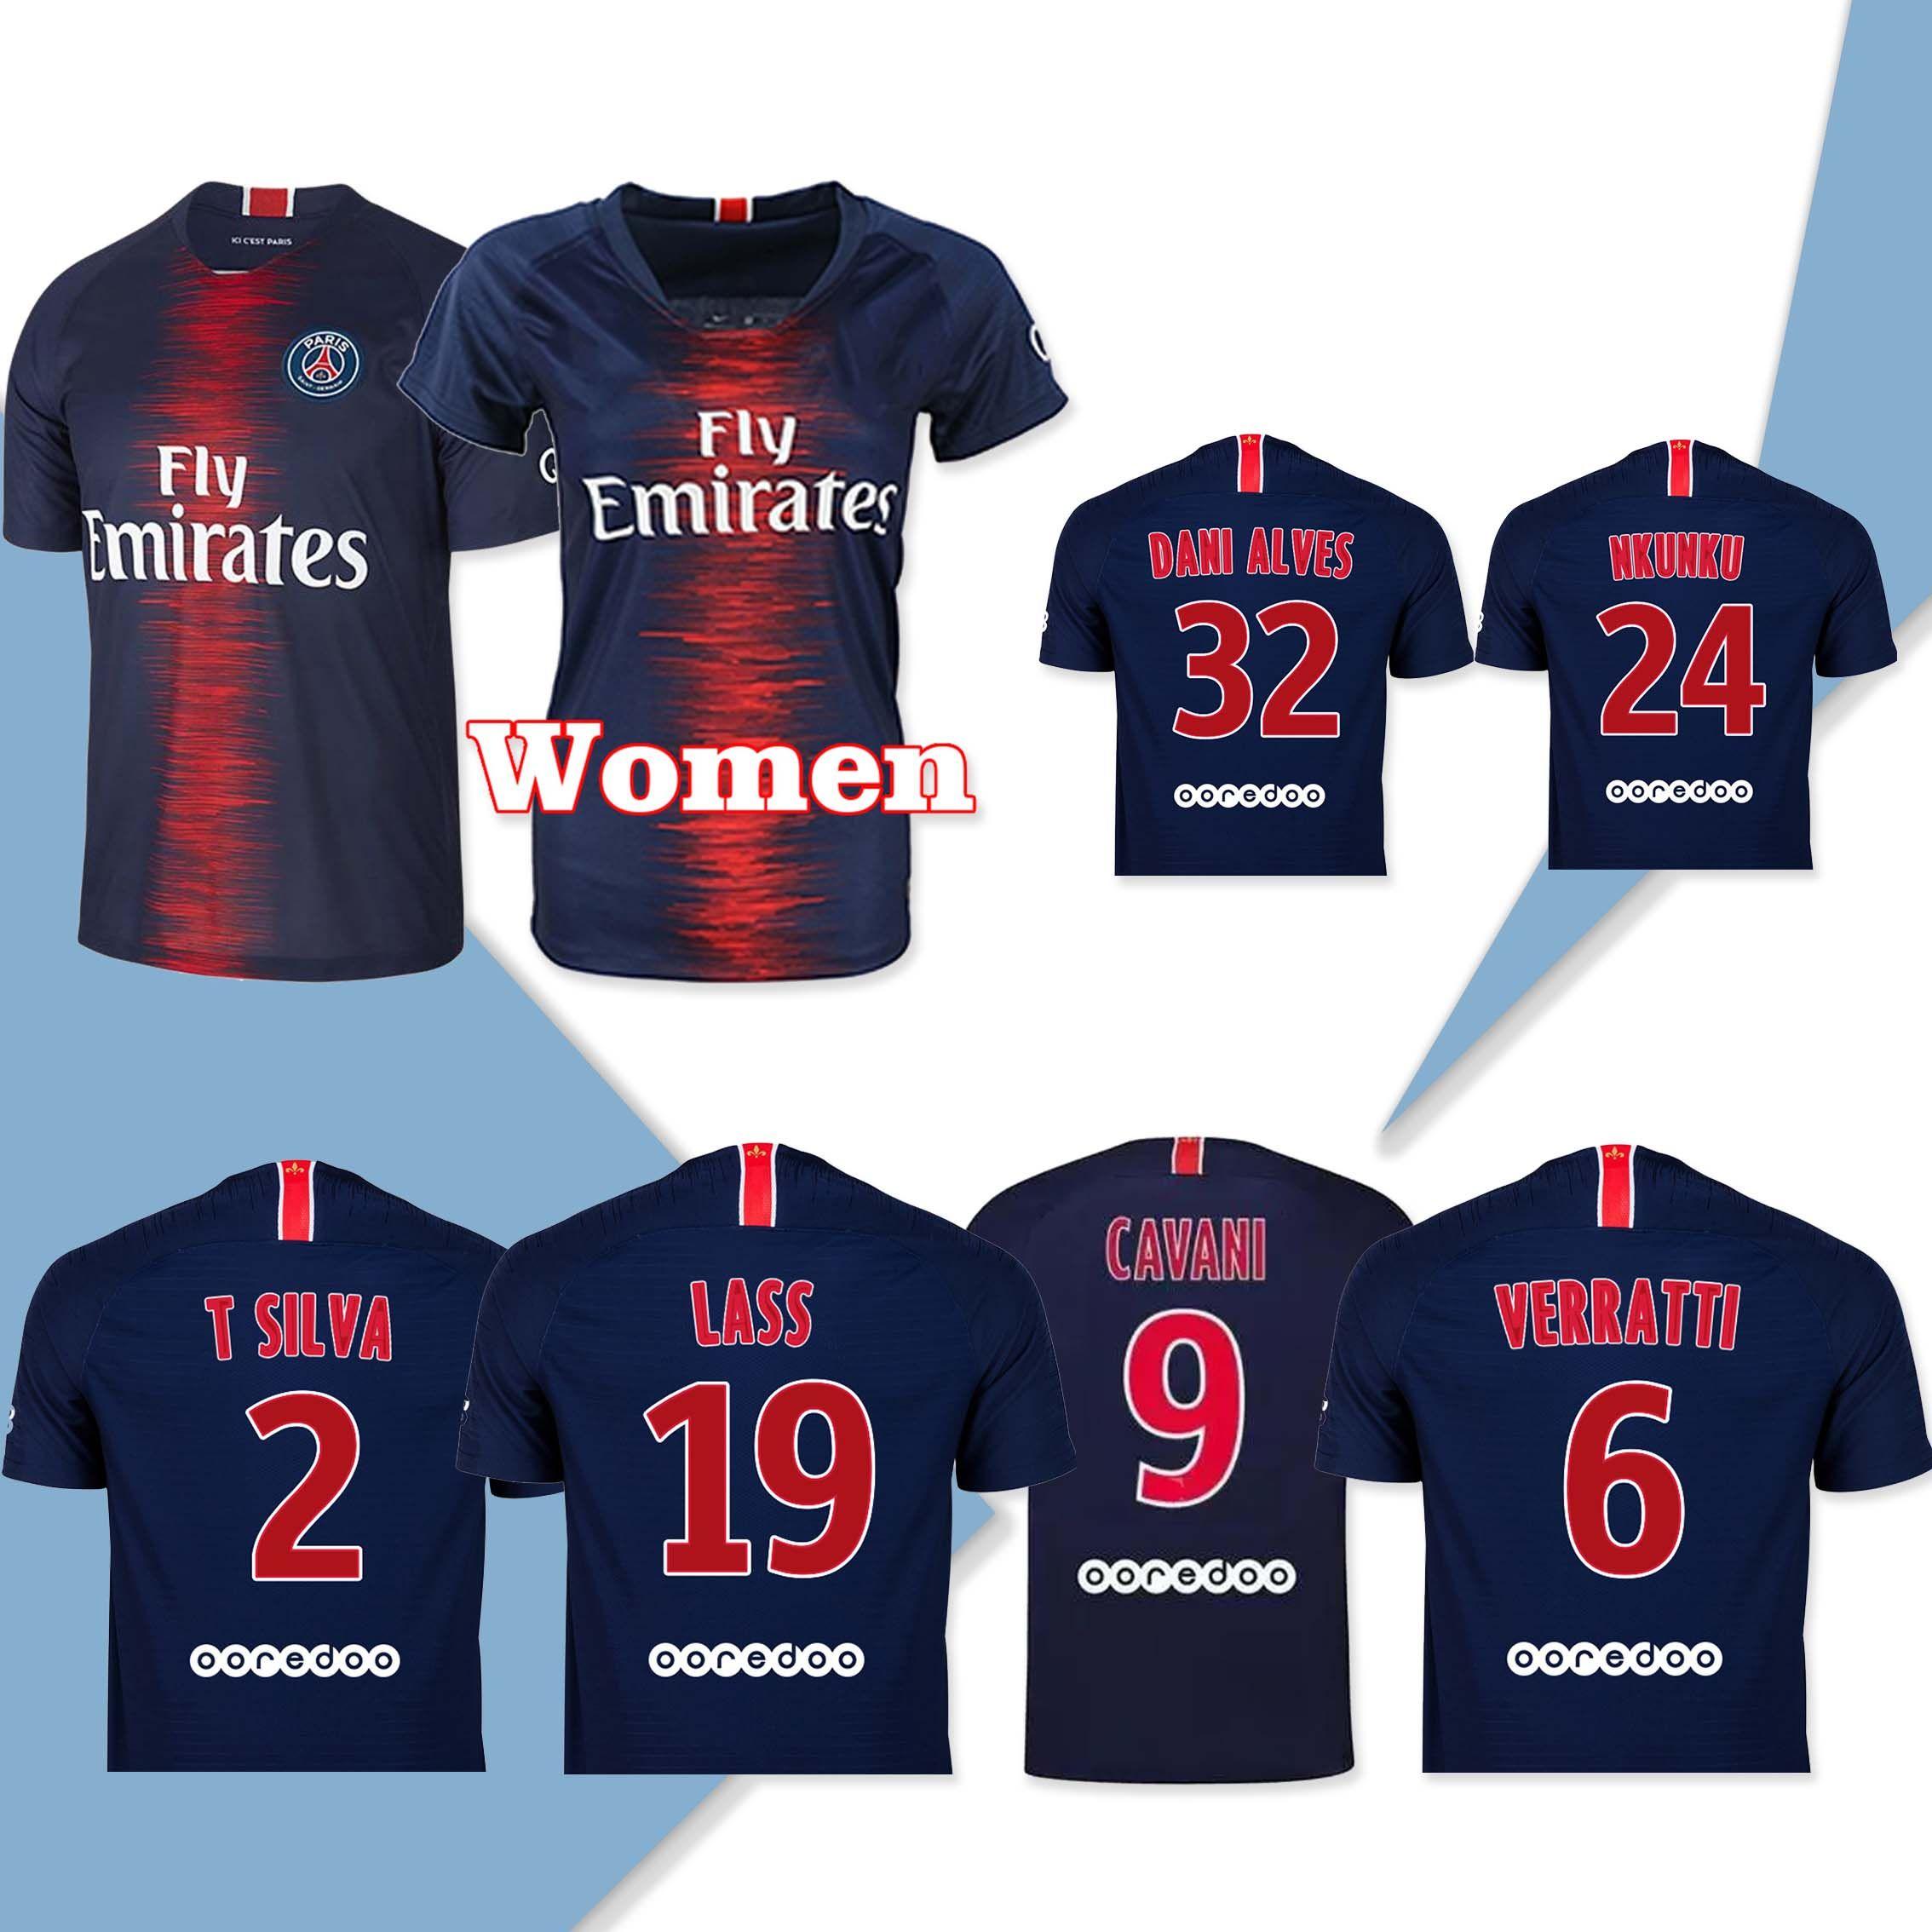 d54780c0d61 2019 18/19 PSG #6 VERRATTI Home Soccer Jersey 2019 Paris Saint Germain Home  Soccer Shirt #9 Cavani #7 MBAPPE Football Uniform From Best_jerseys_store,  ...